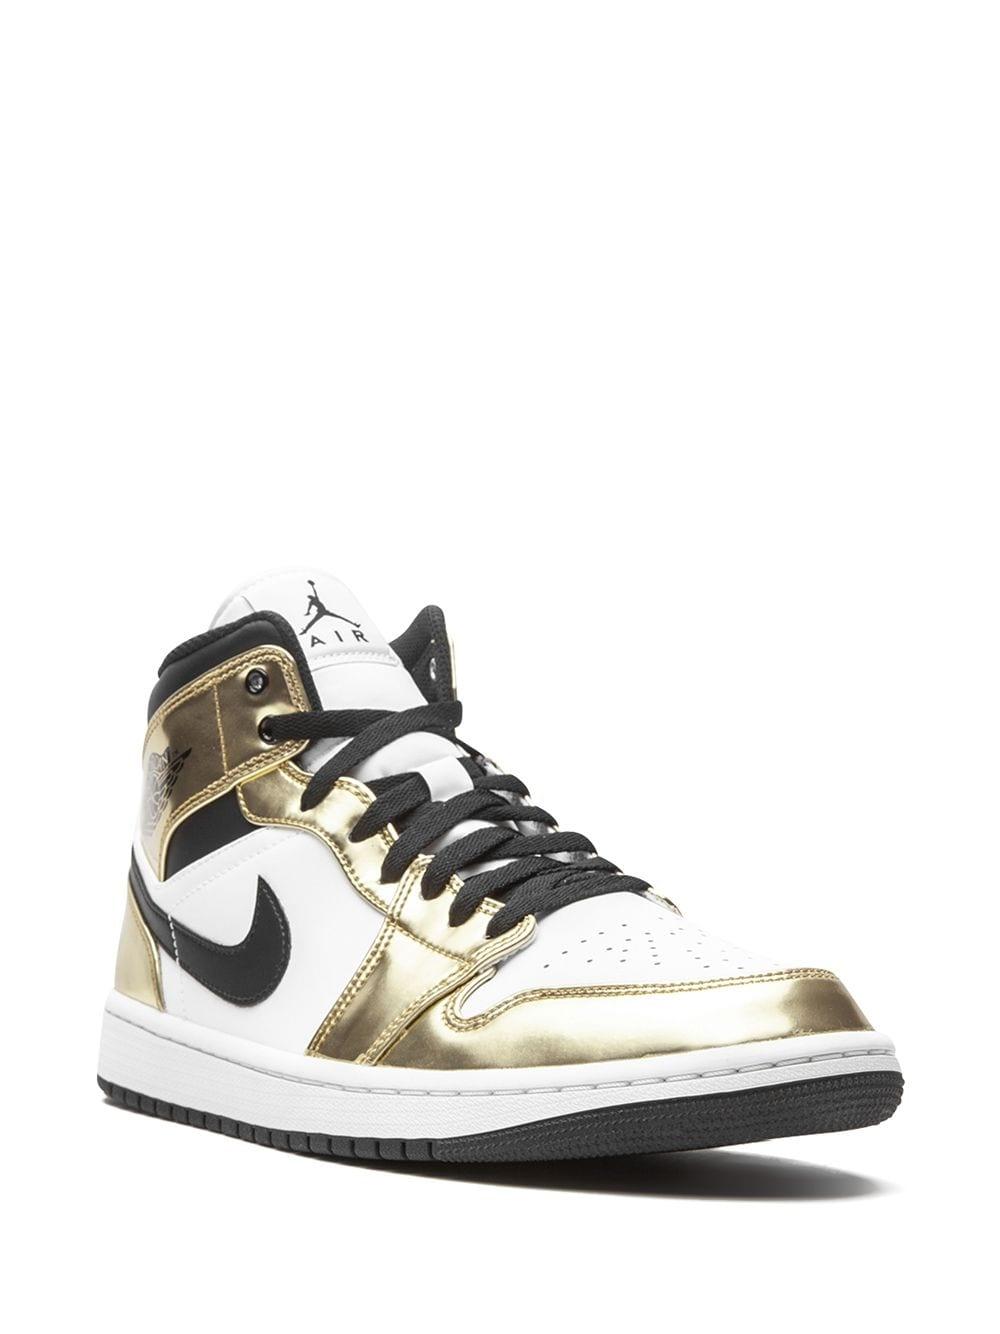 Кроссовки Jordan 1 Mid Metallic Gold Black White